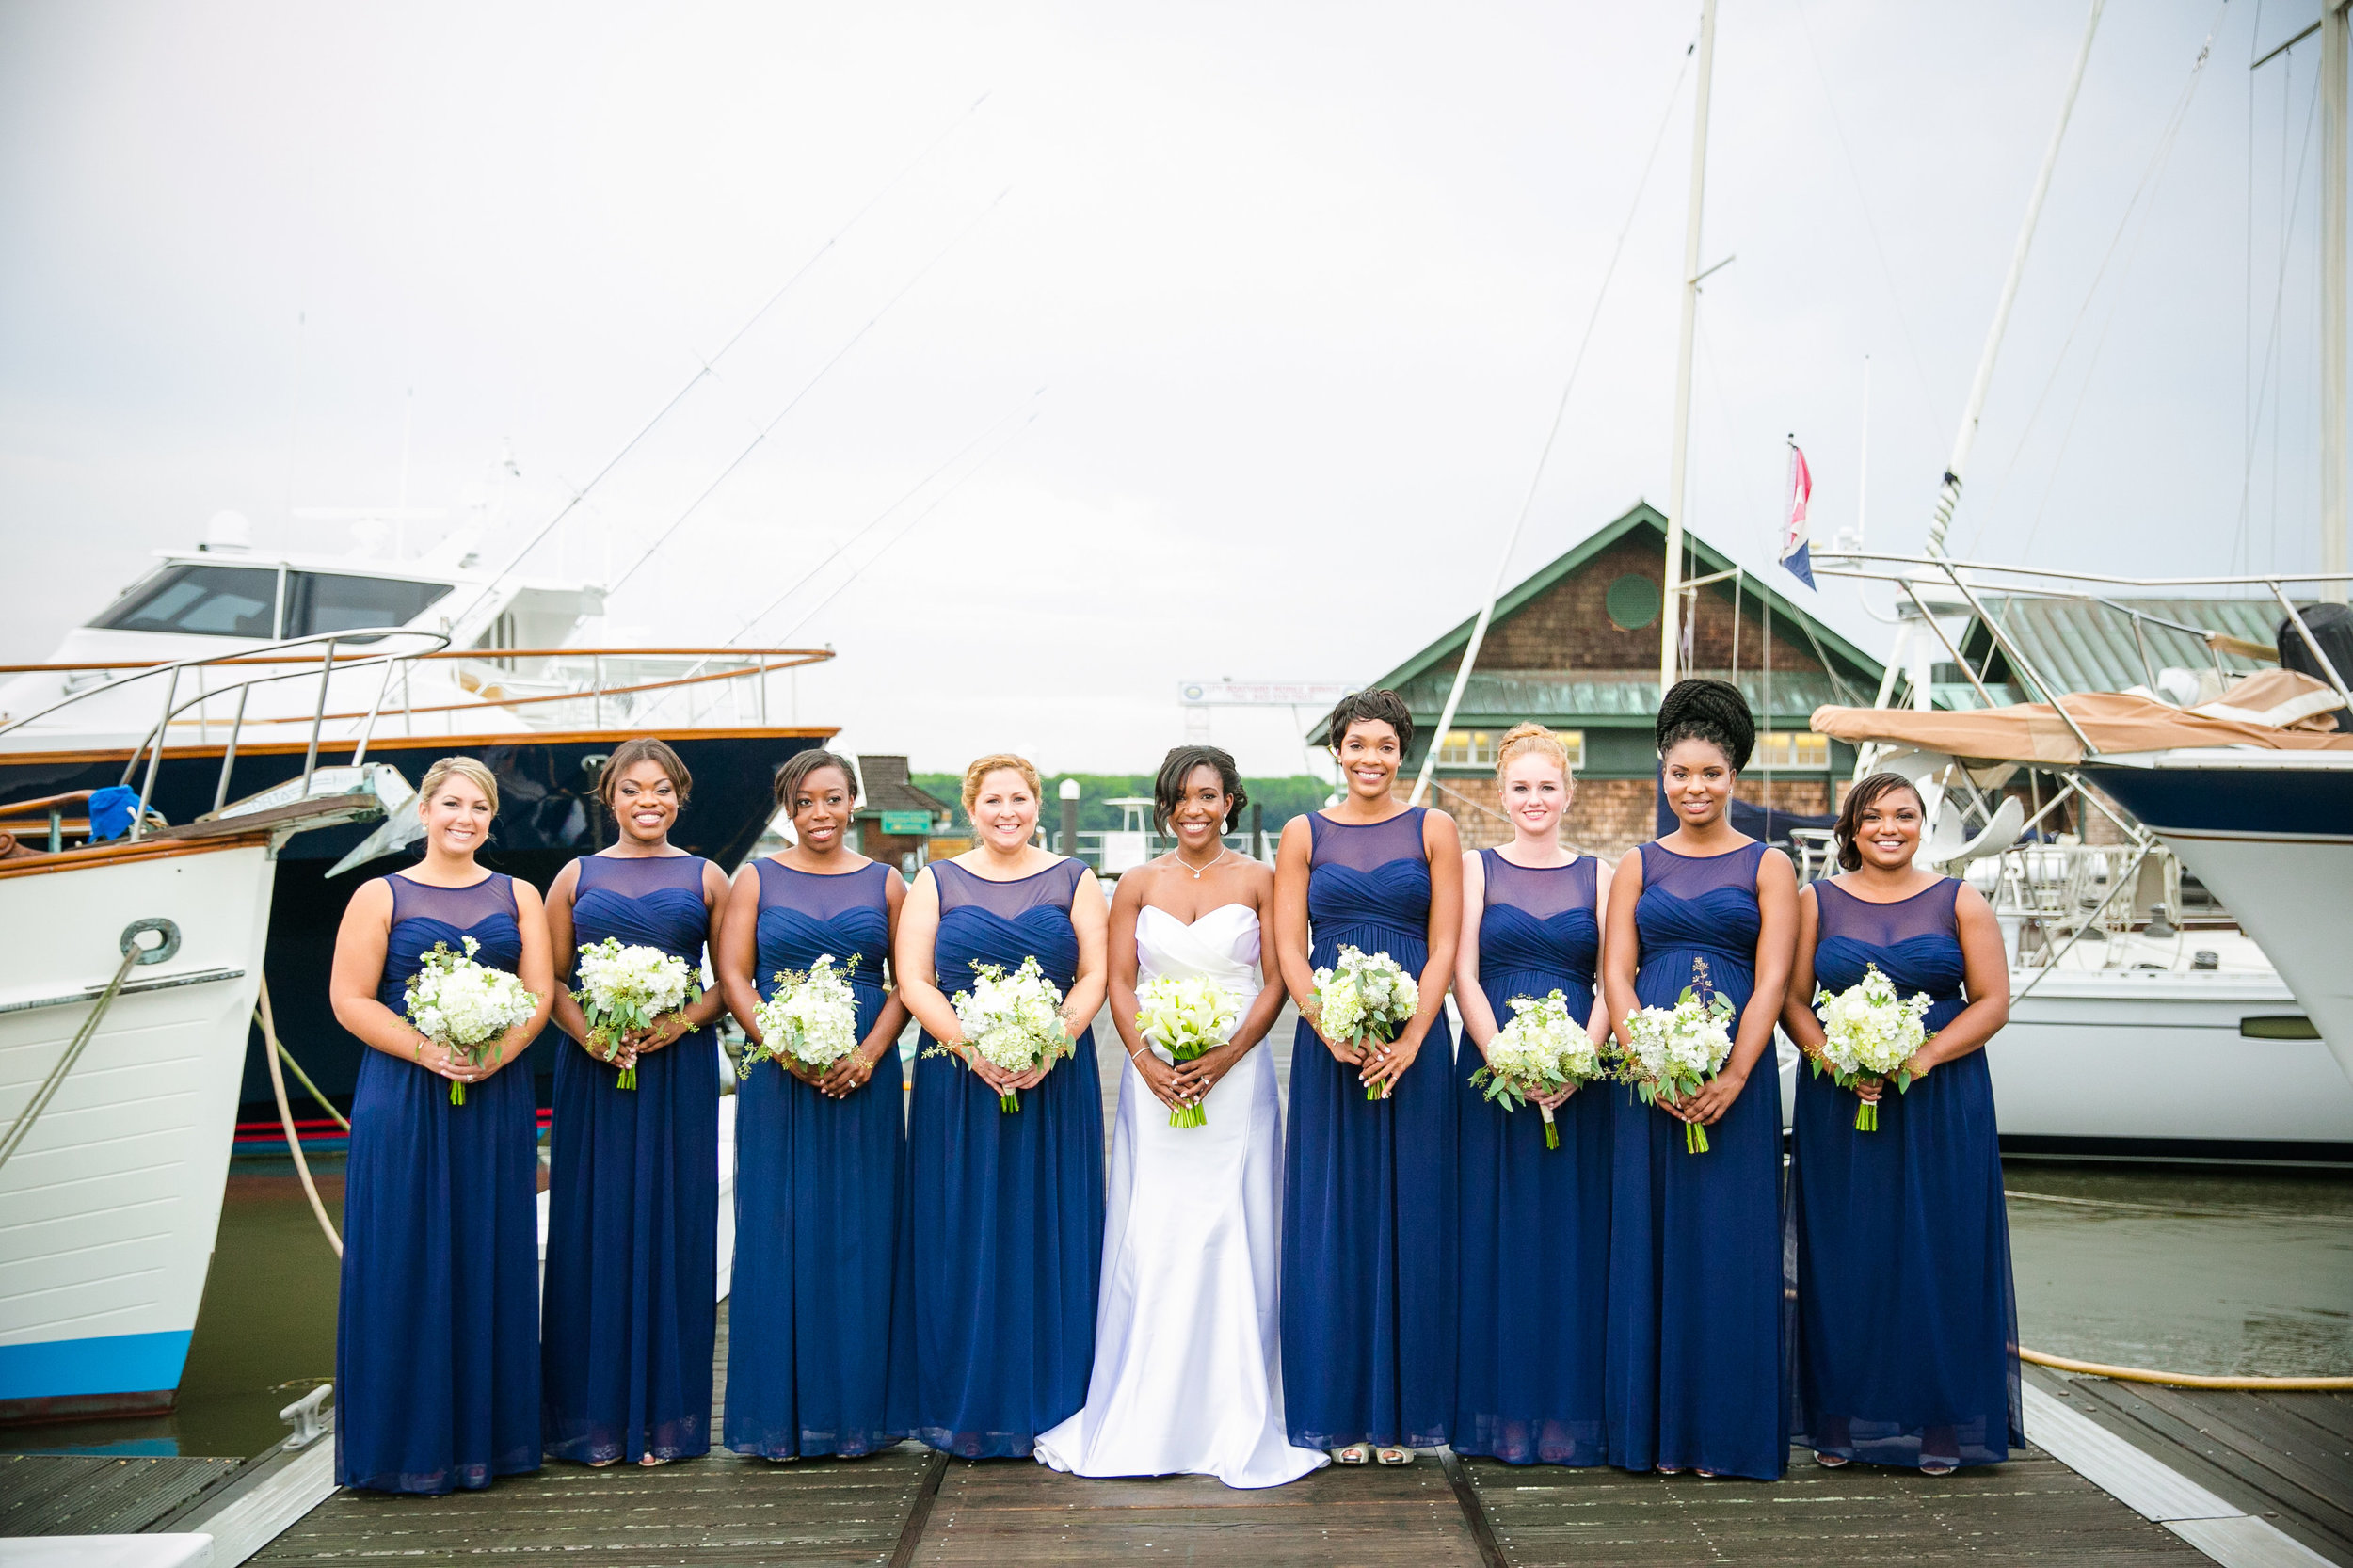 royal-blue-bridesmaid-dress-nautical-wedding-portrait